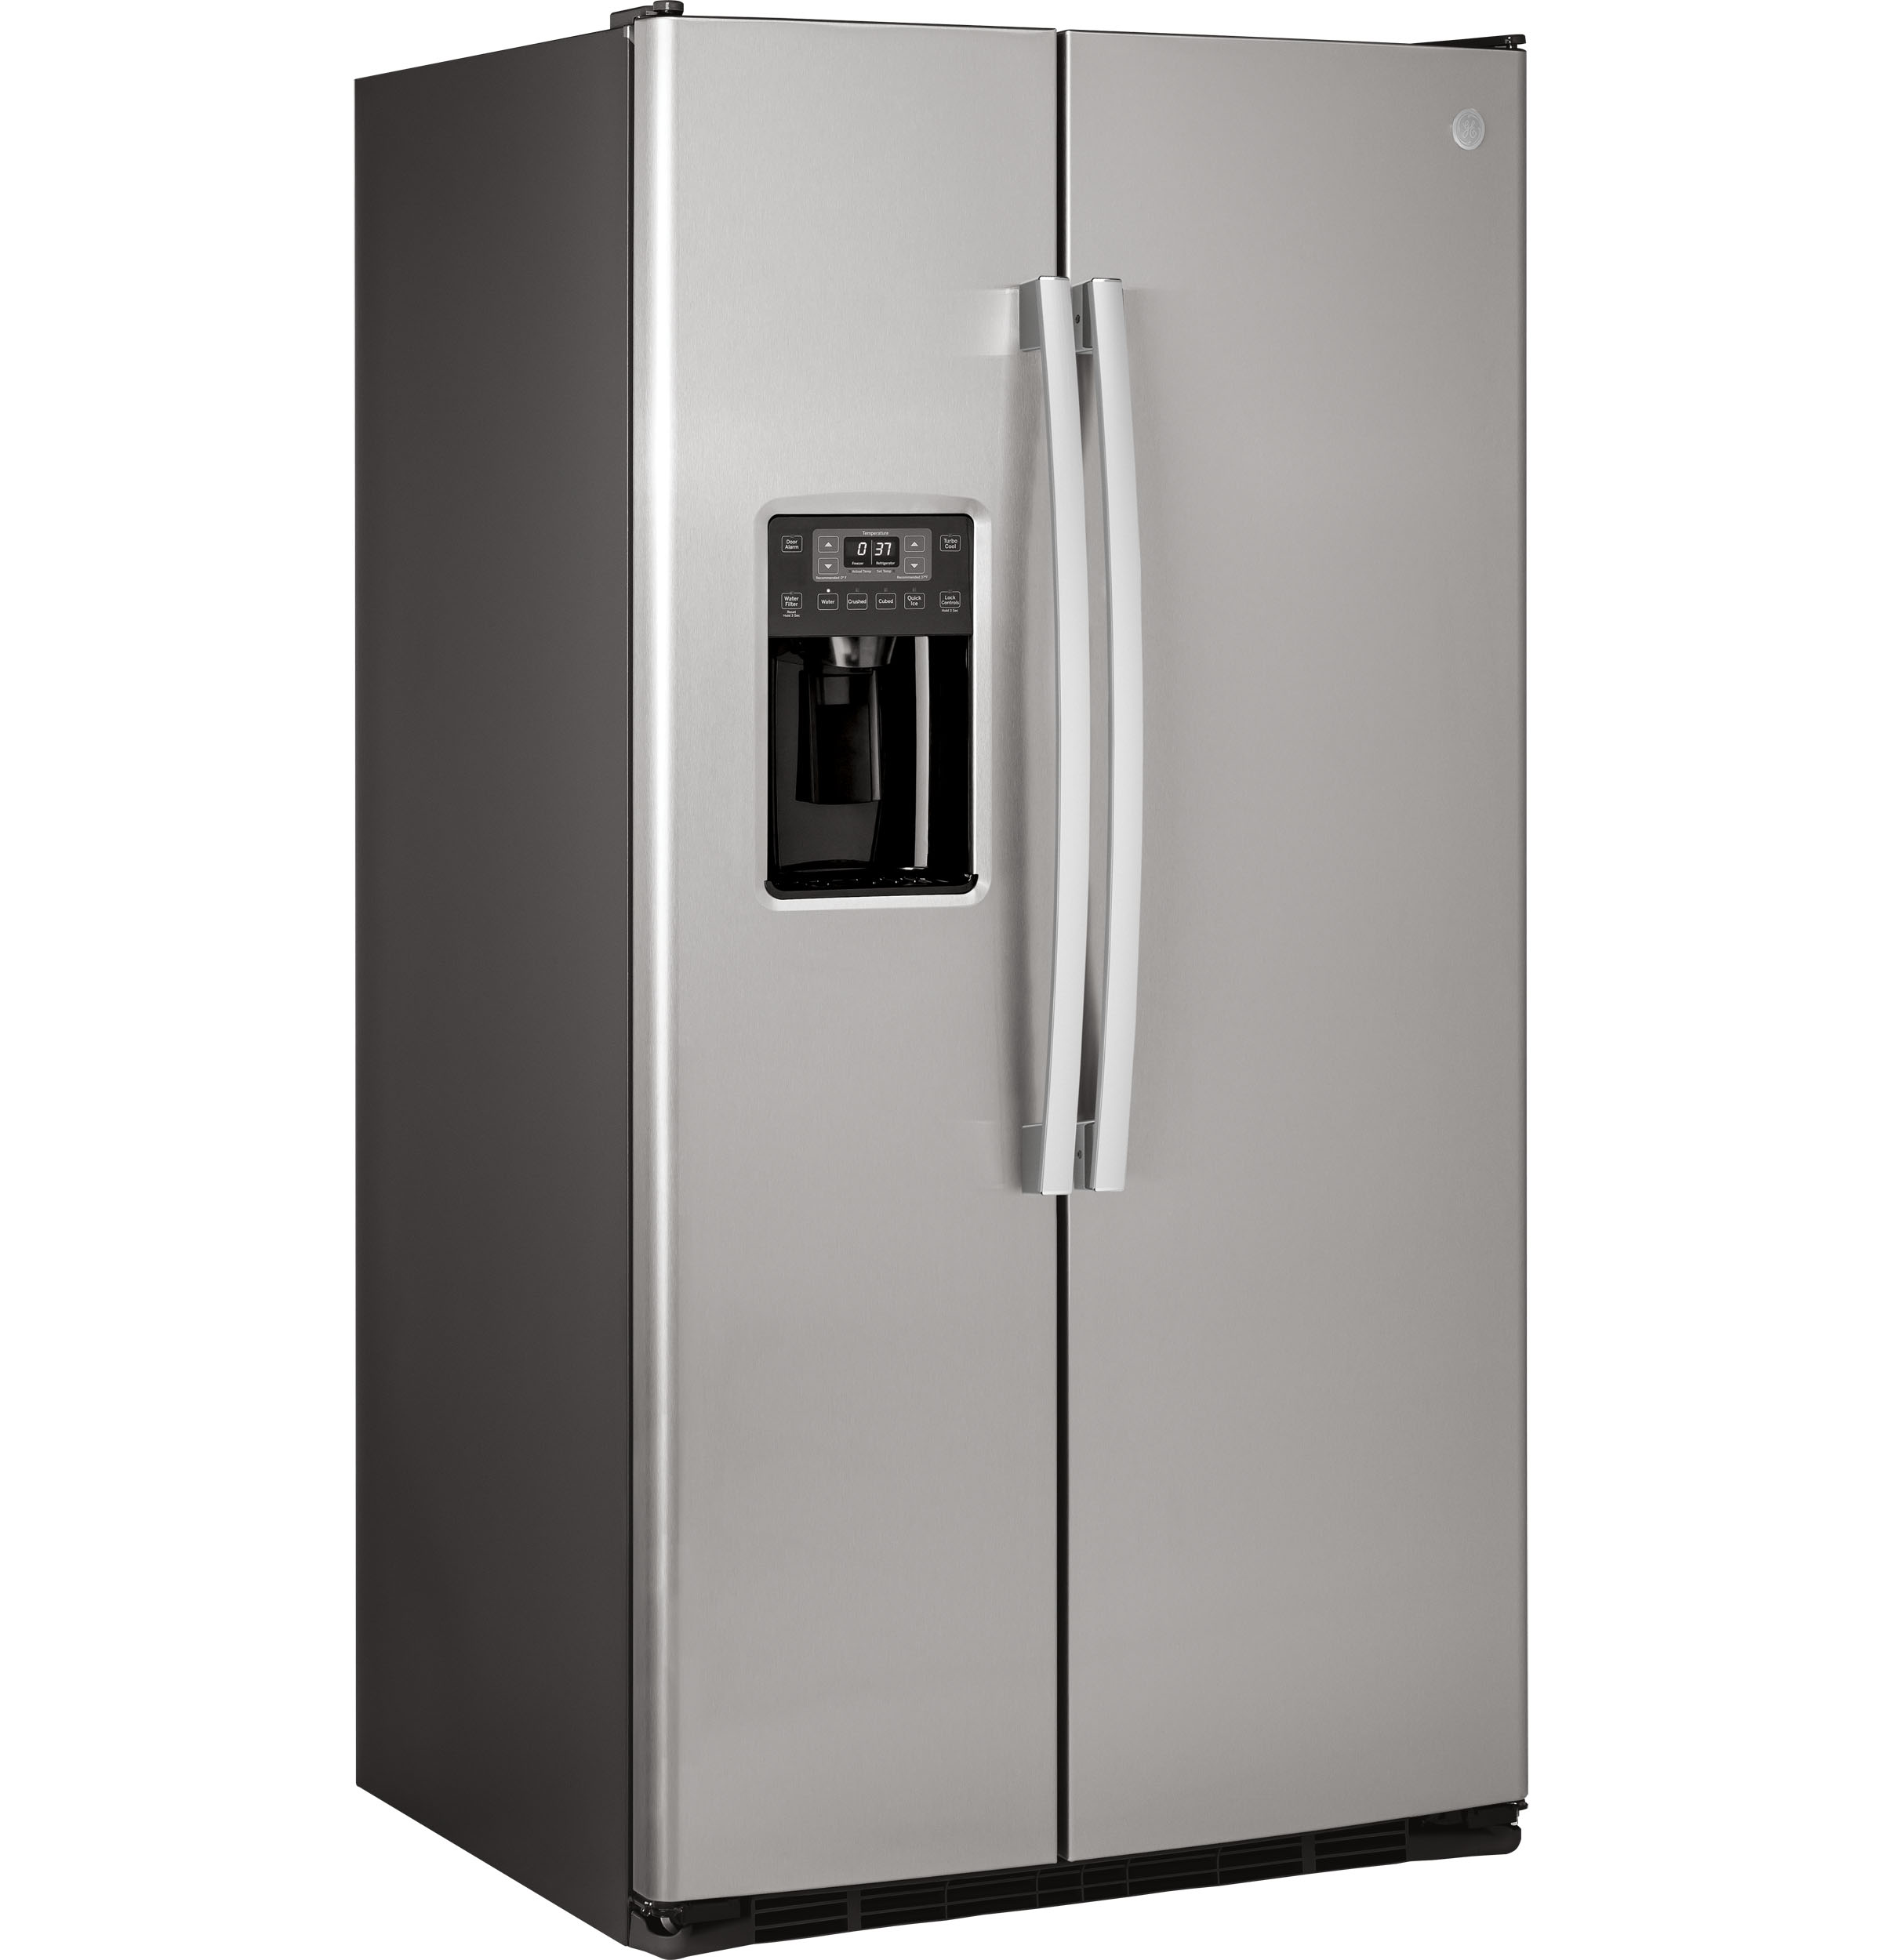 Model: GSS25GSHSS | GE GE® 25.3 Cu. Ft. Side-By-Side Refrigerator